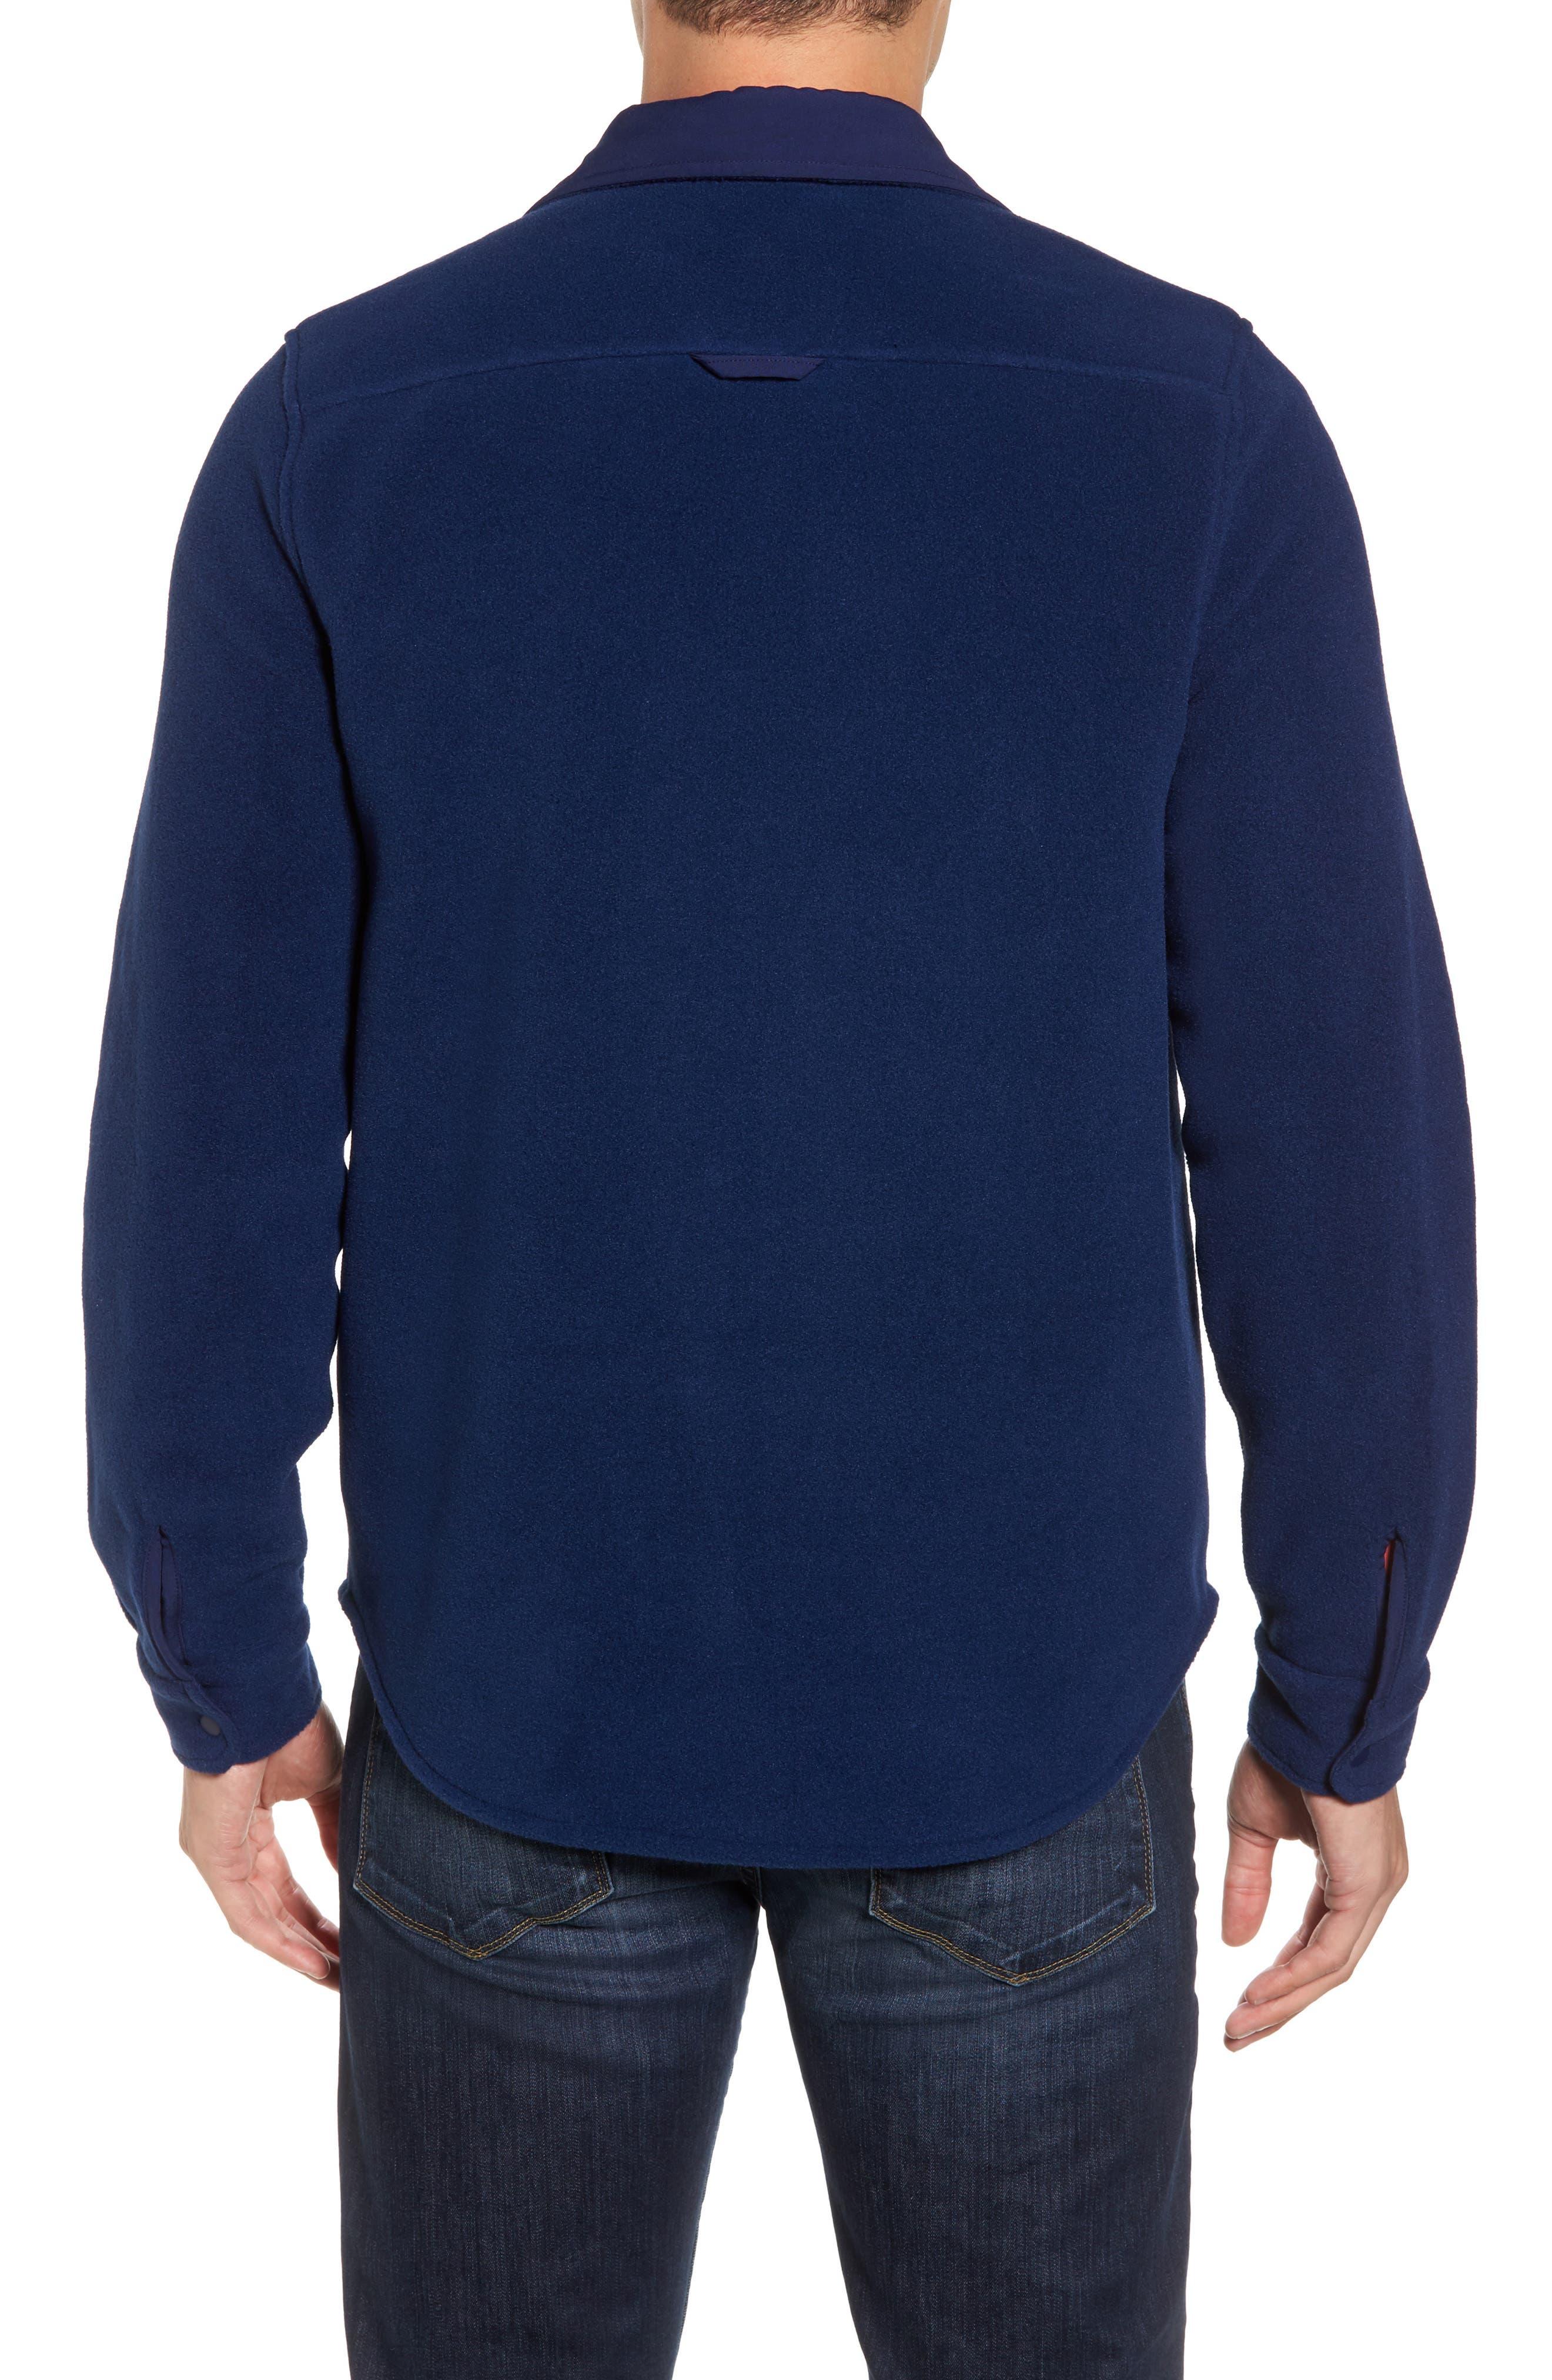 Alternate Image 2  - vineyard vines Snap Front Fleece Jacket